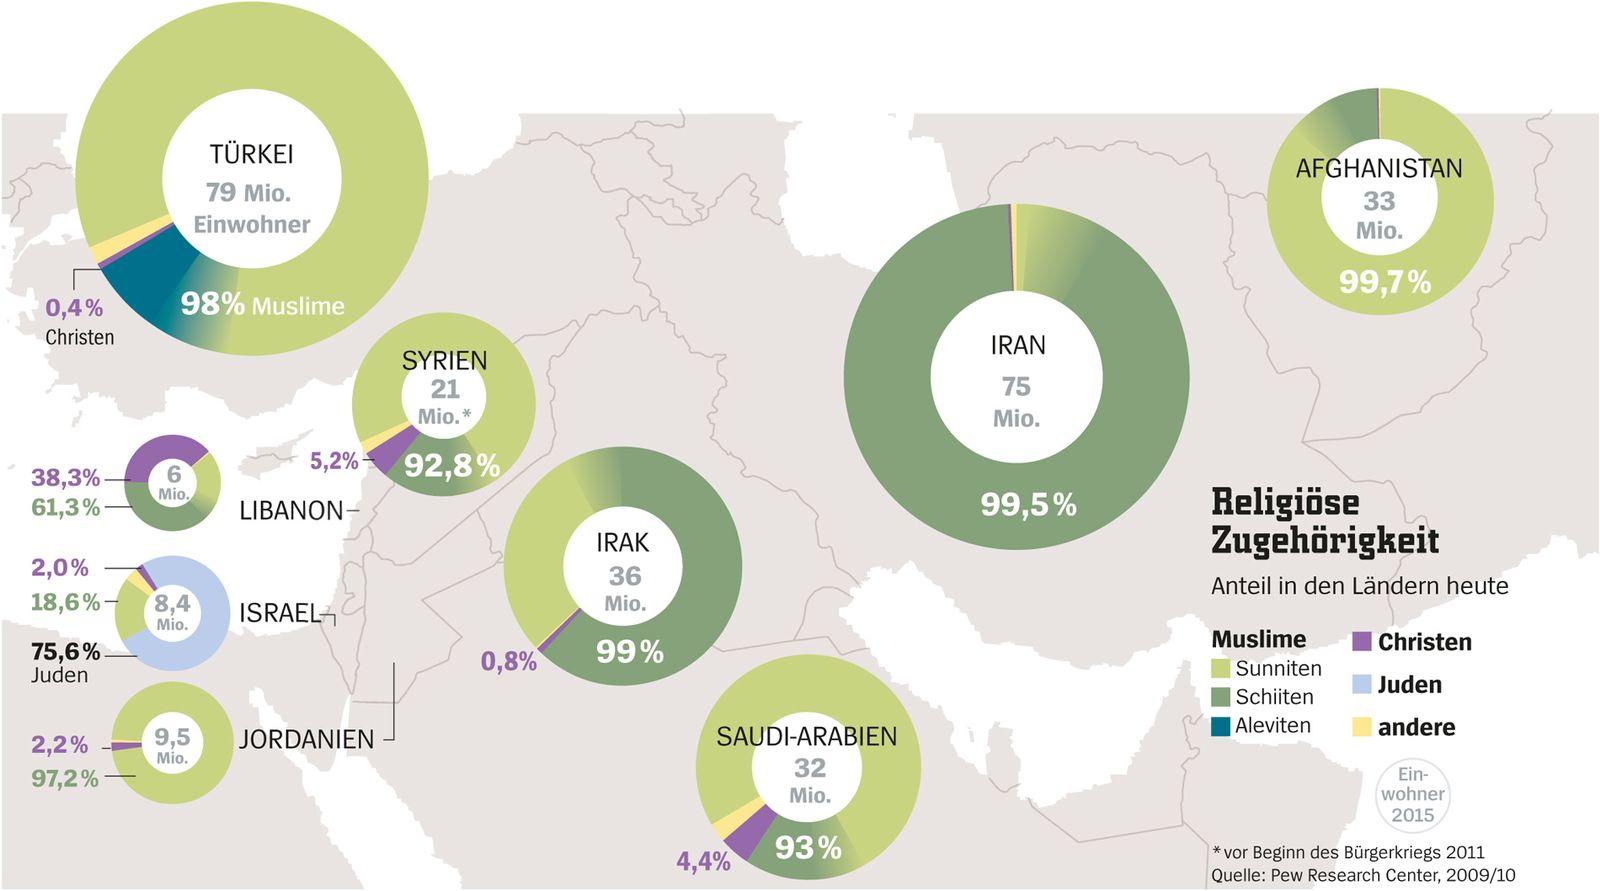 SPGE 1/2017 Grafik Islam / Religiöse Zugehörigheit